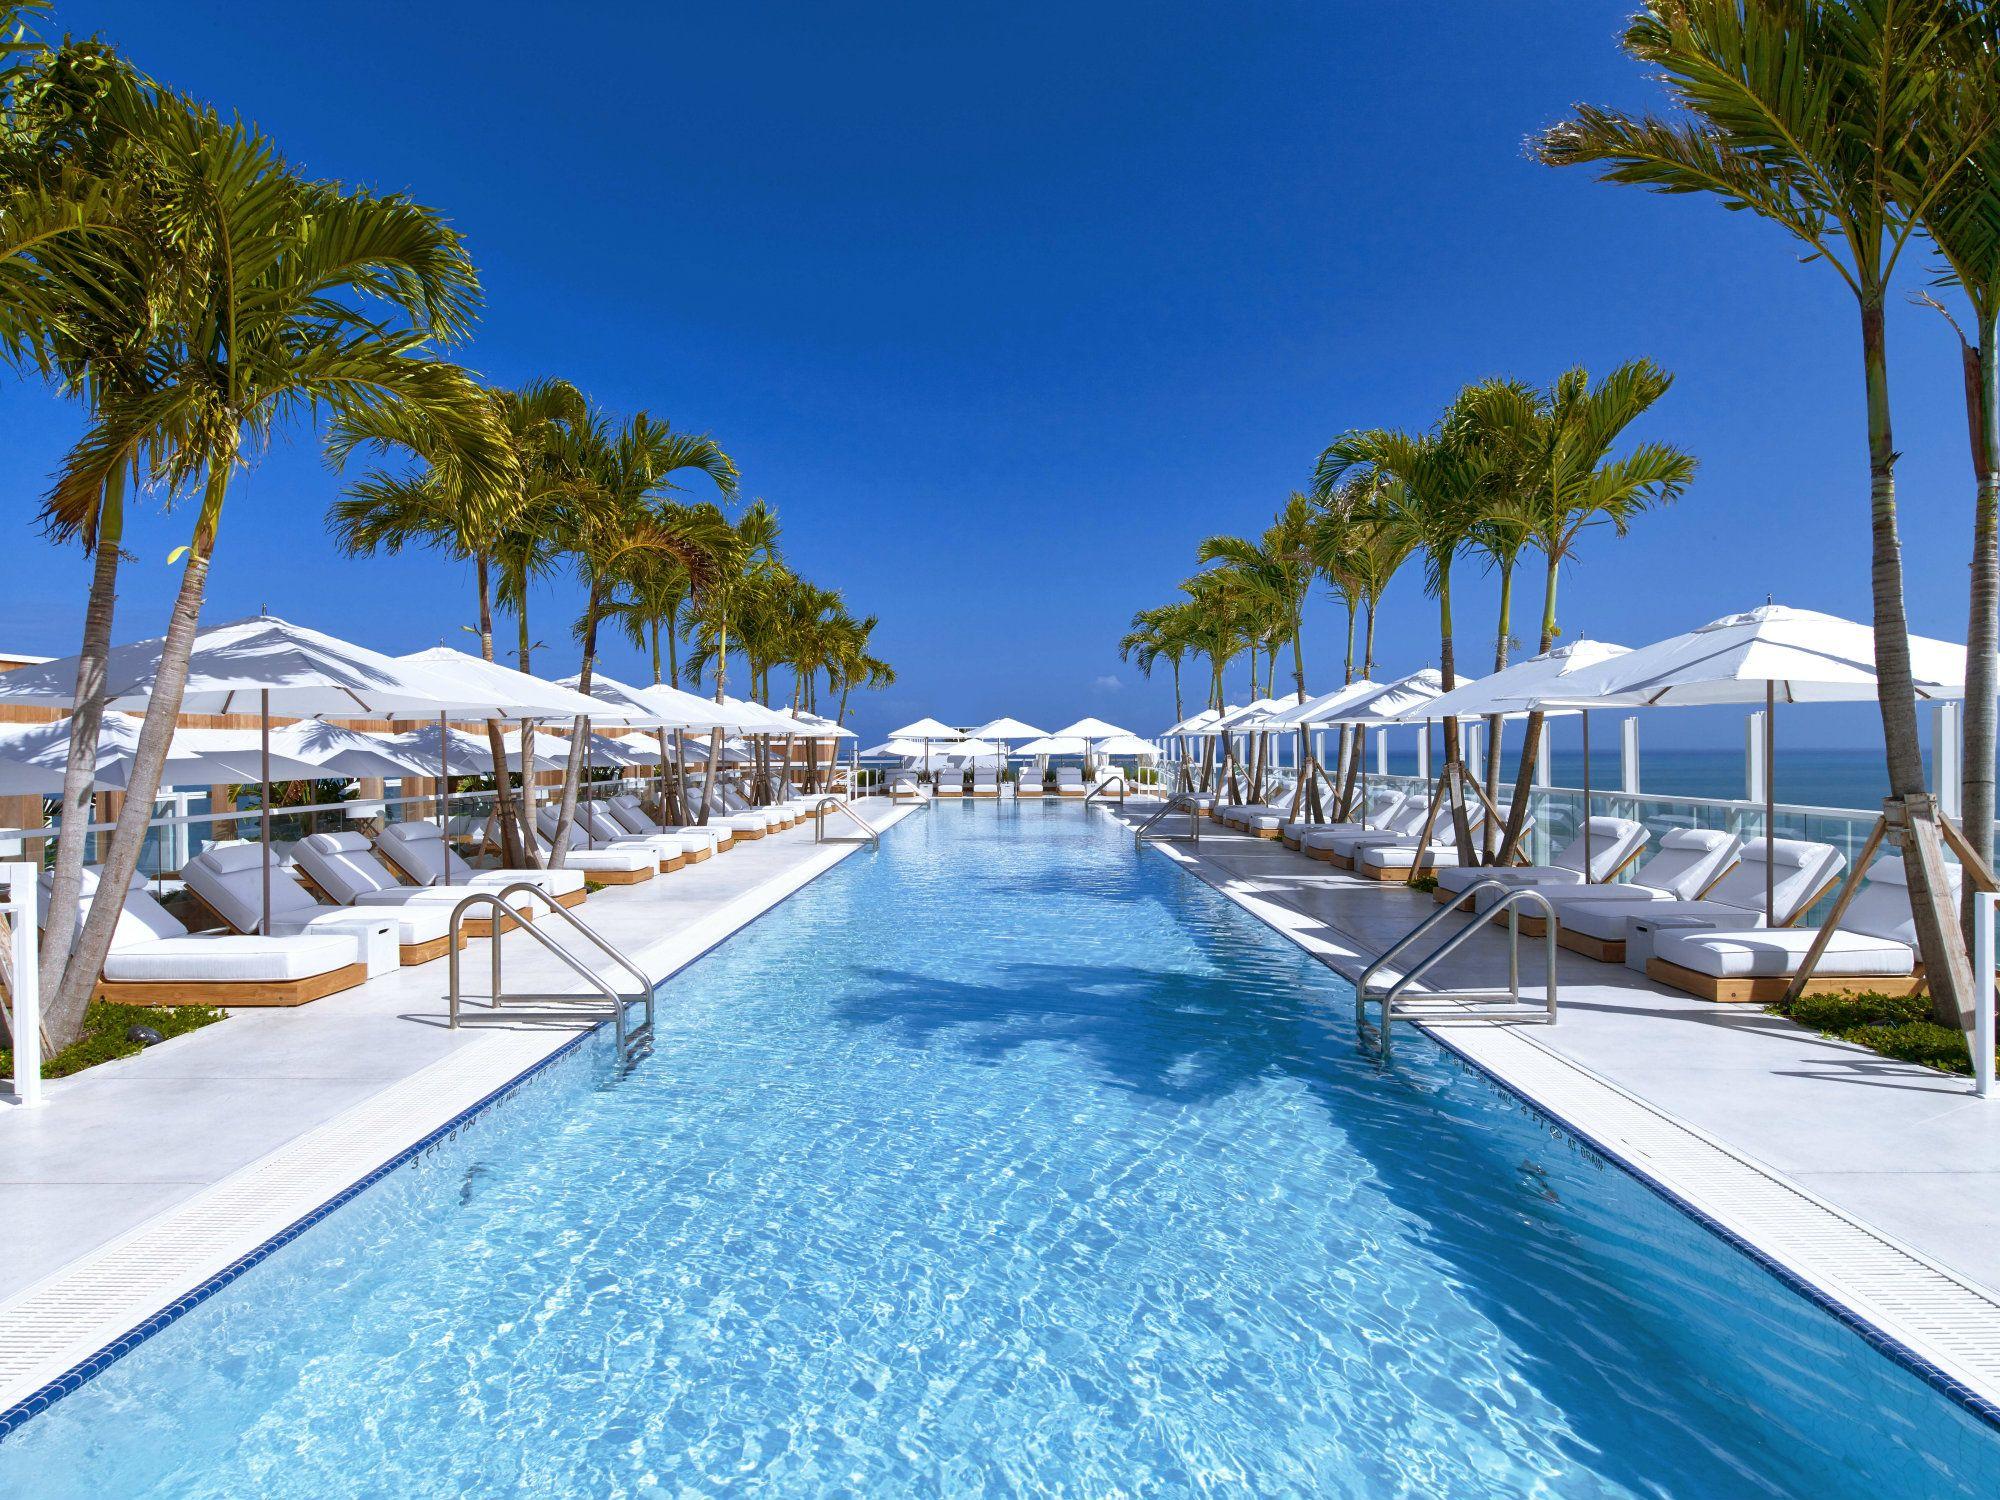 Win A Fashion Girl Getaway To 1 Hotel South Beach With Images South Beach Hotels Miami Hotels South Beach Miami Hotels